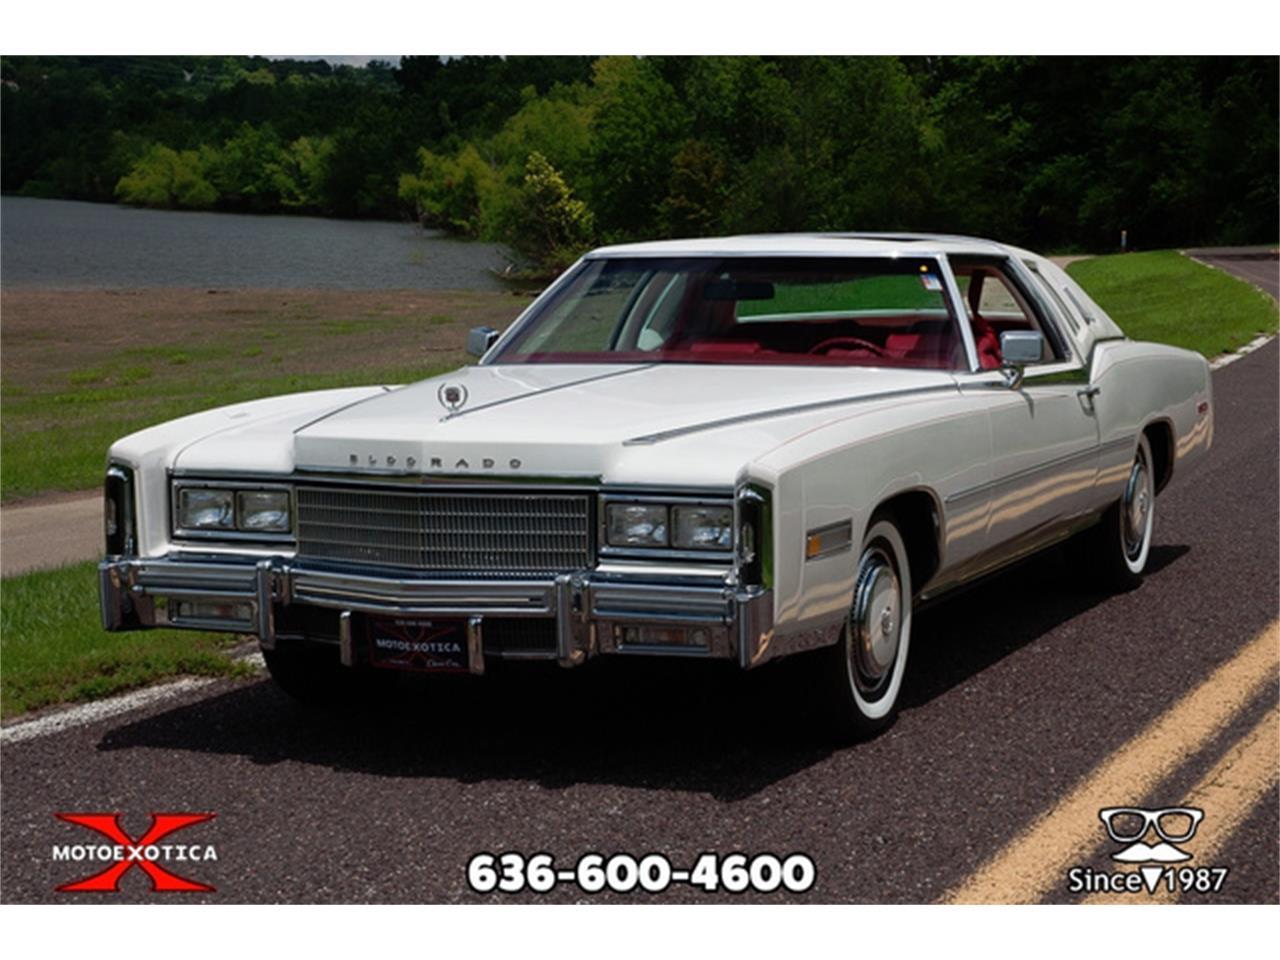 1977 Cadillac Eldorado (CC-1256650) for sale in St. Louis, Missouri